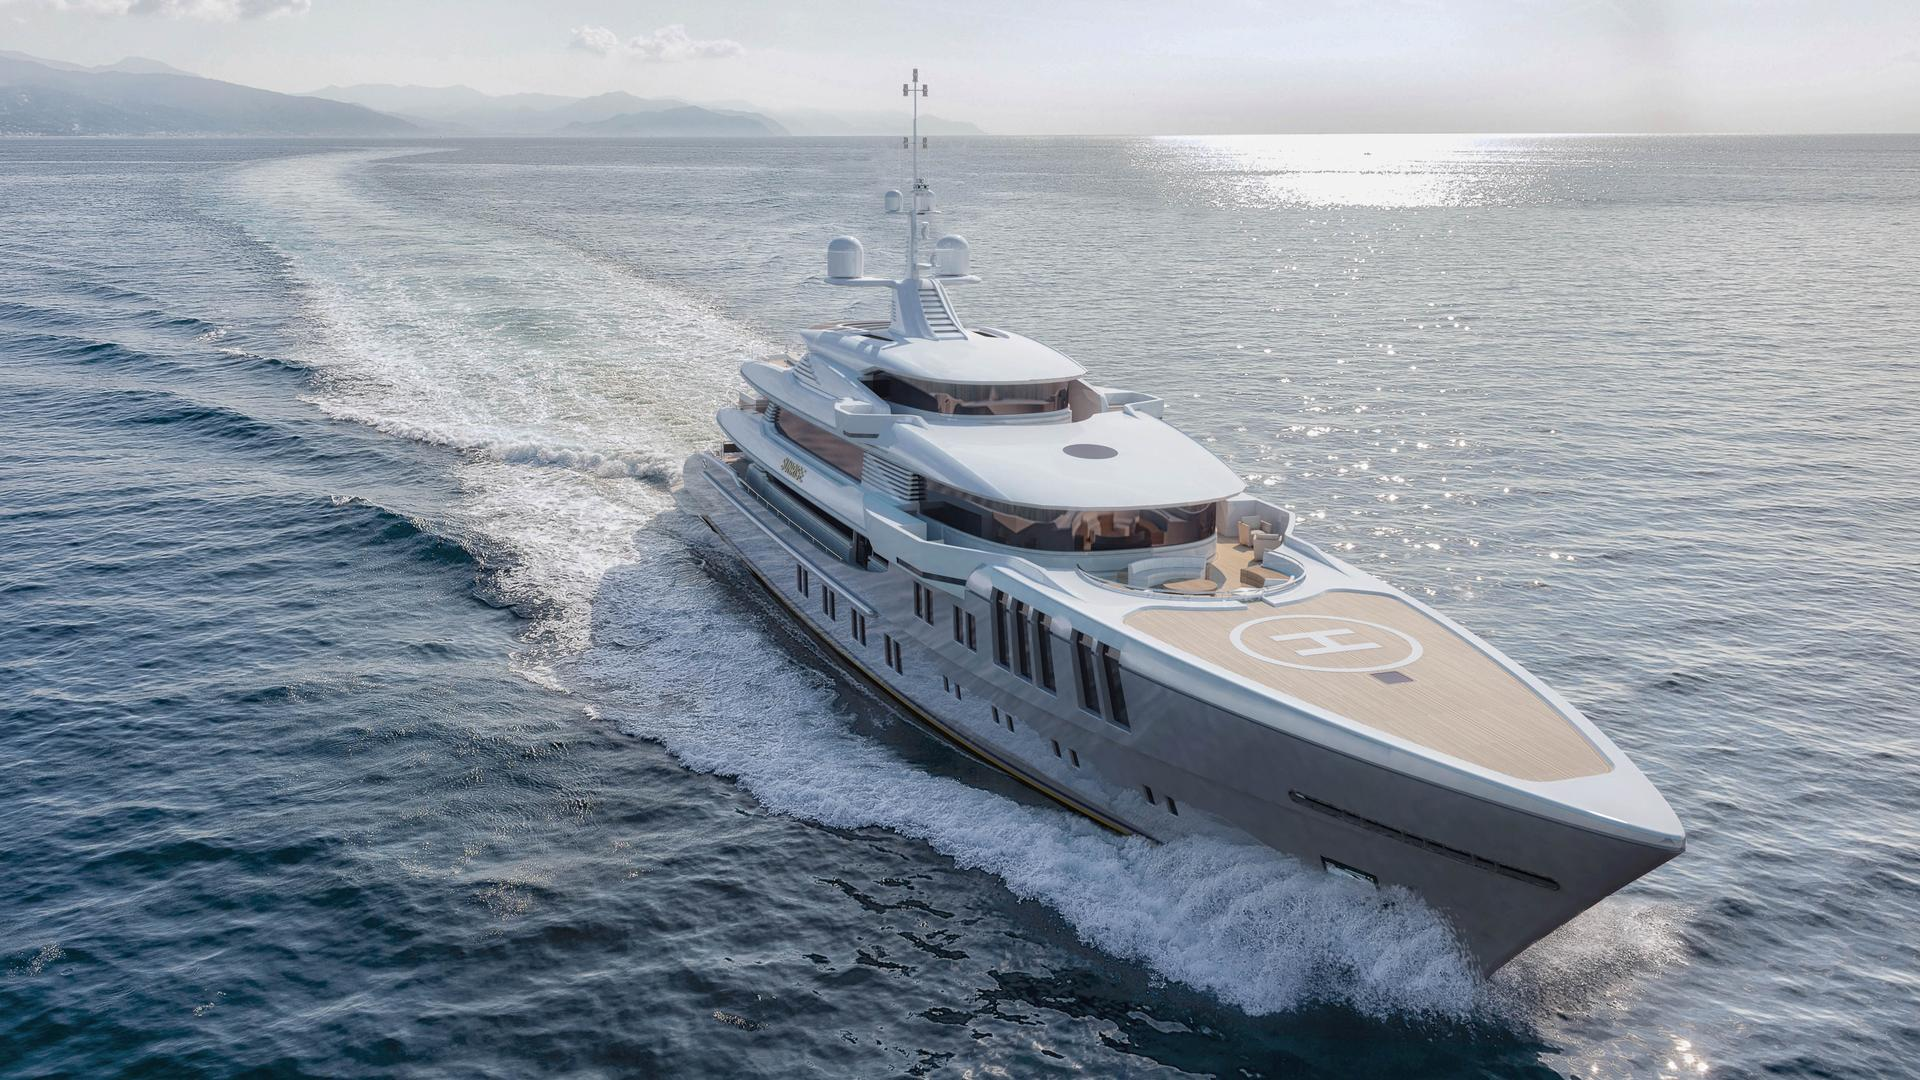 zenith-motor-yacht-sunrise-2017-70m-cruising